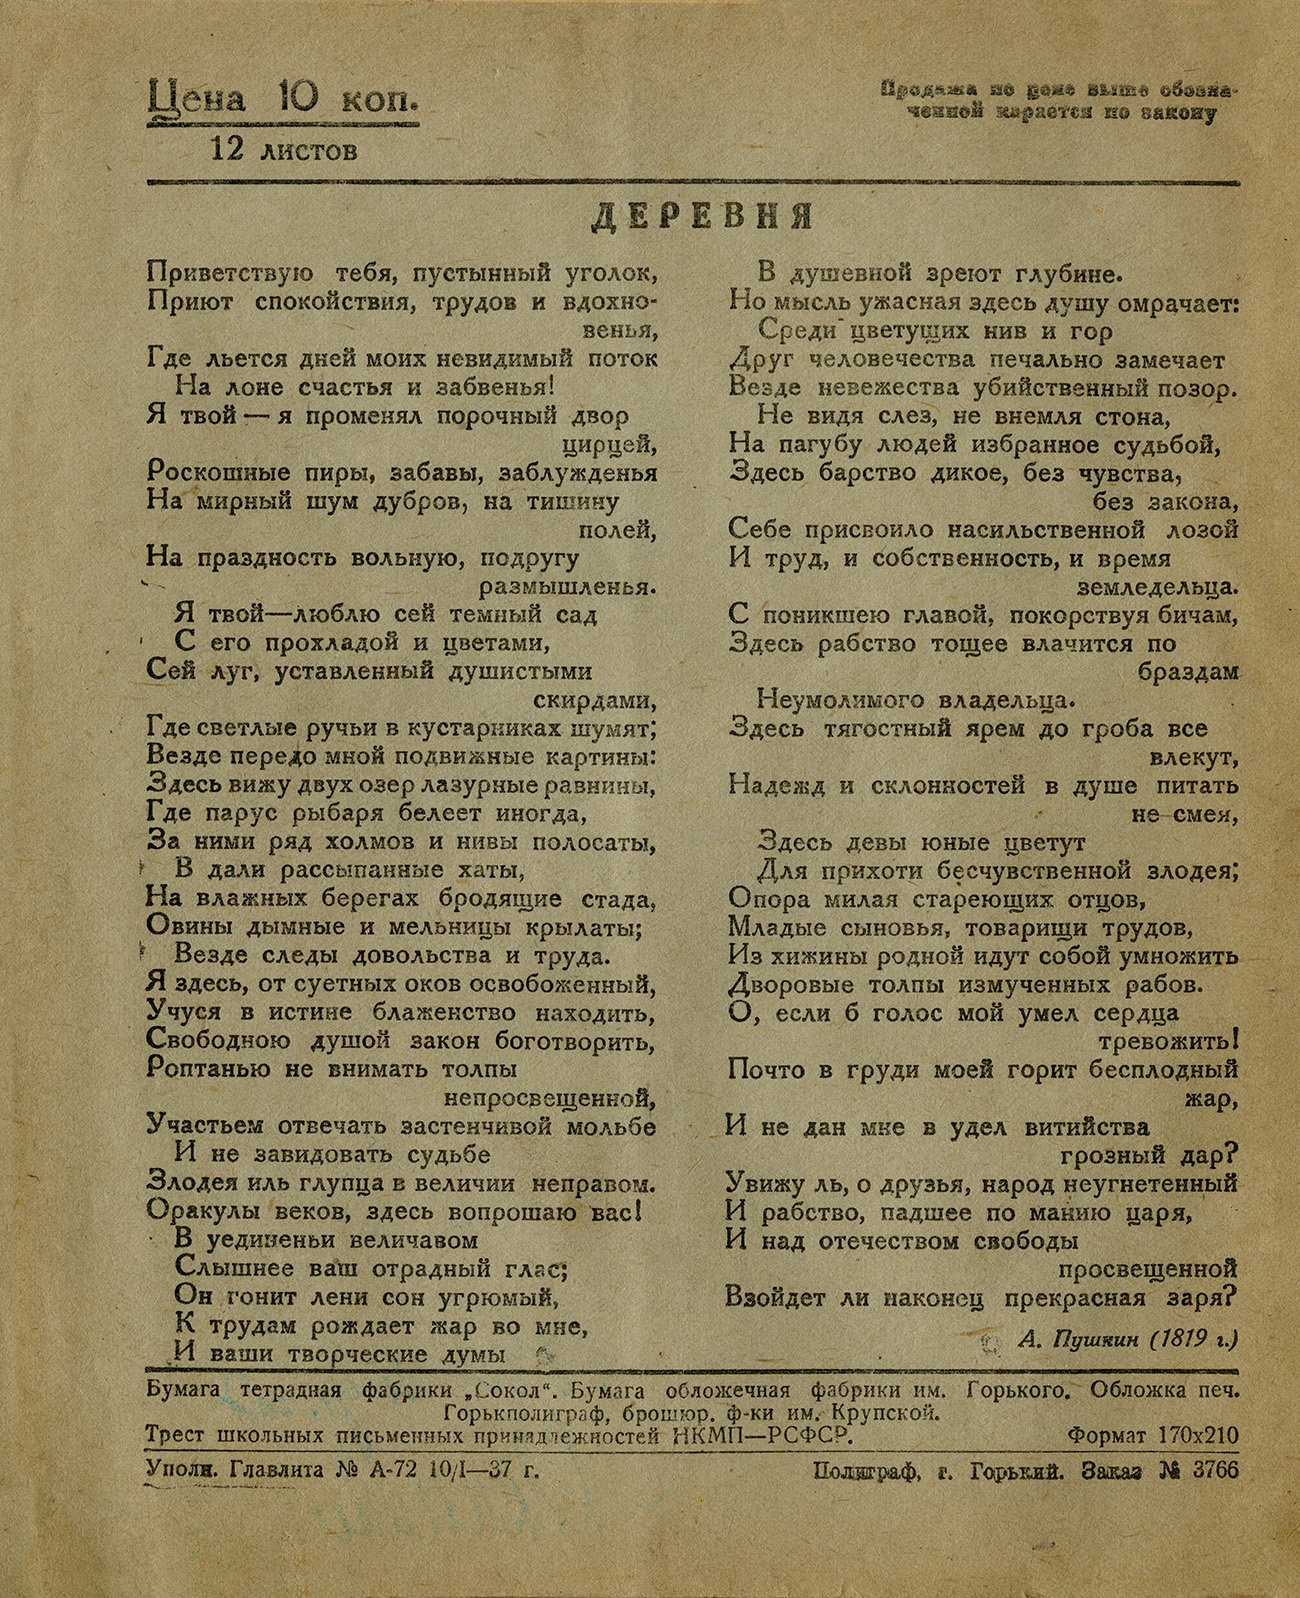 Тетрадь Пушкин 13 оборот